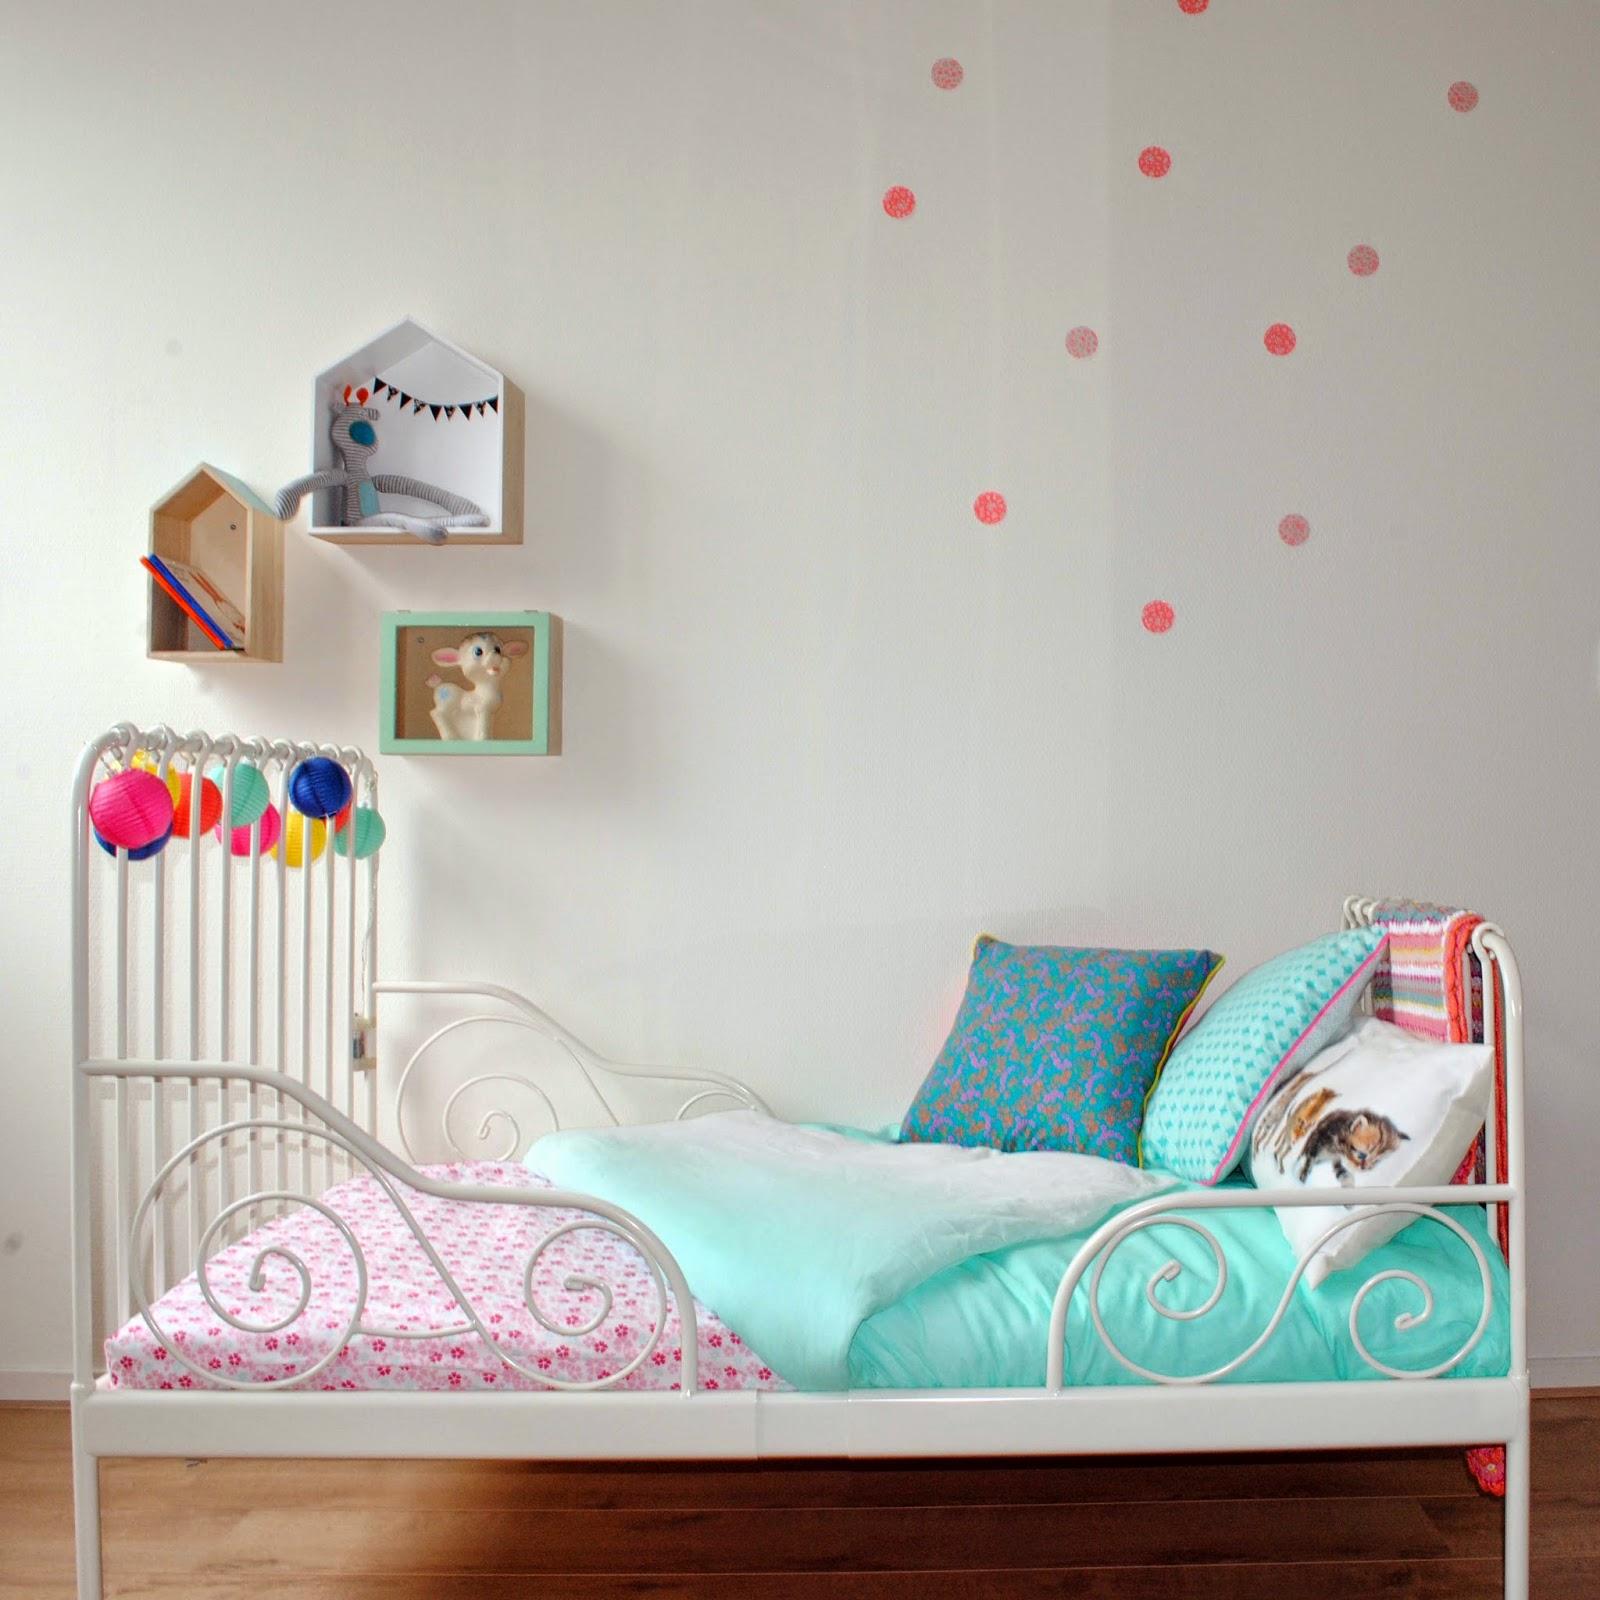 Tuutsjes: bregjes grote bed